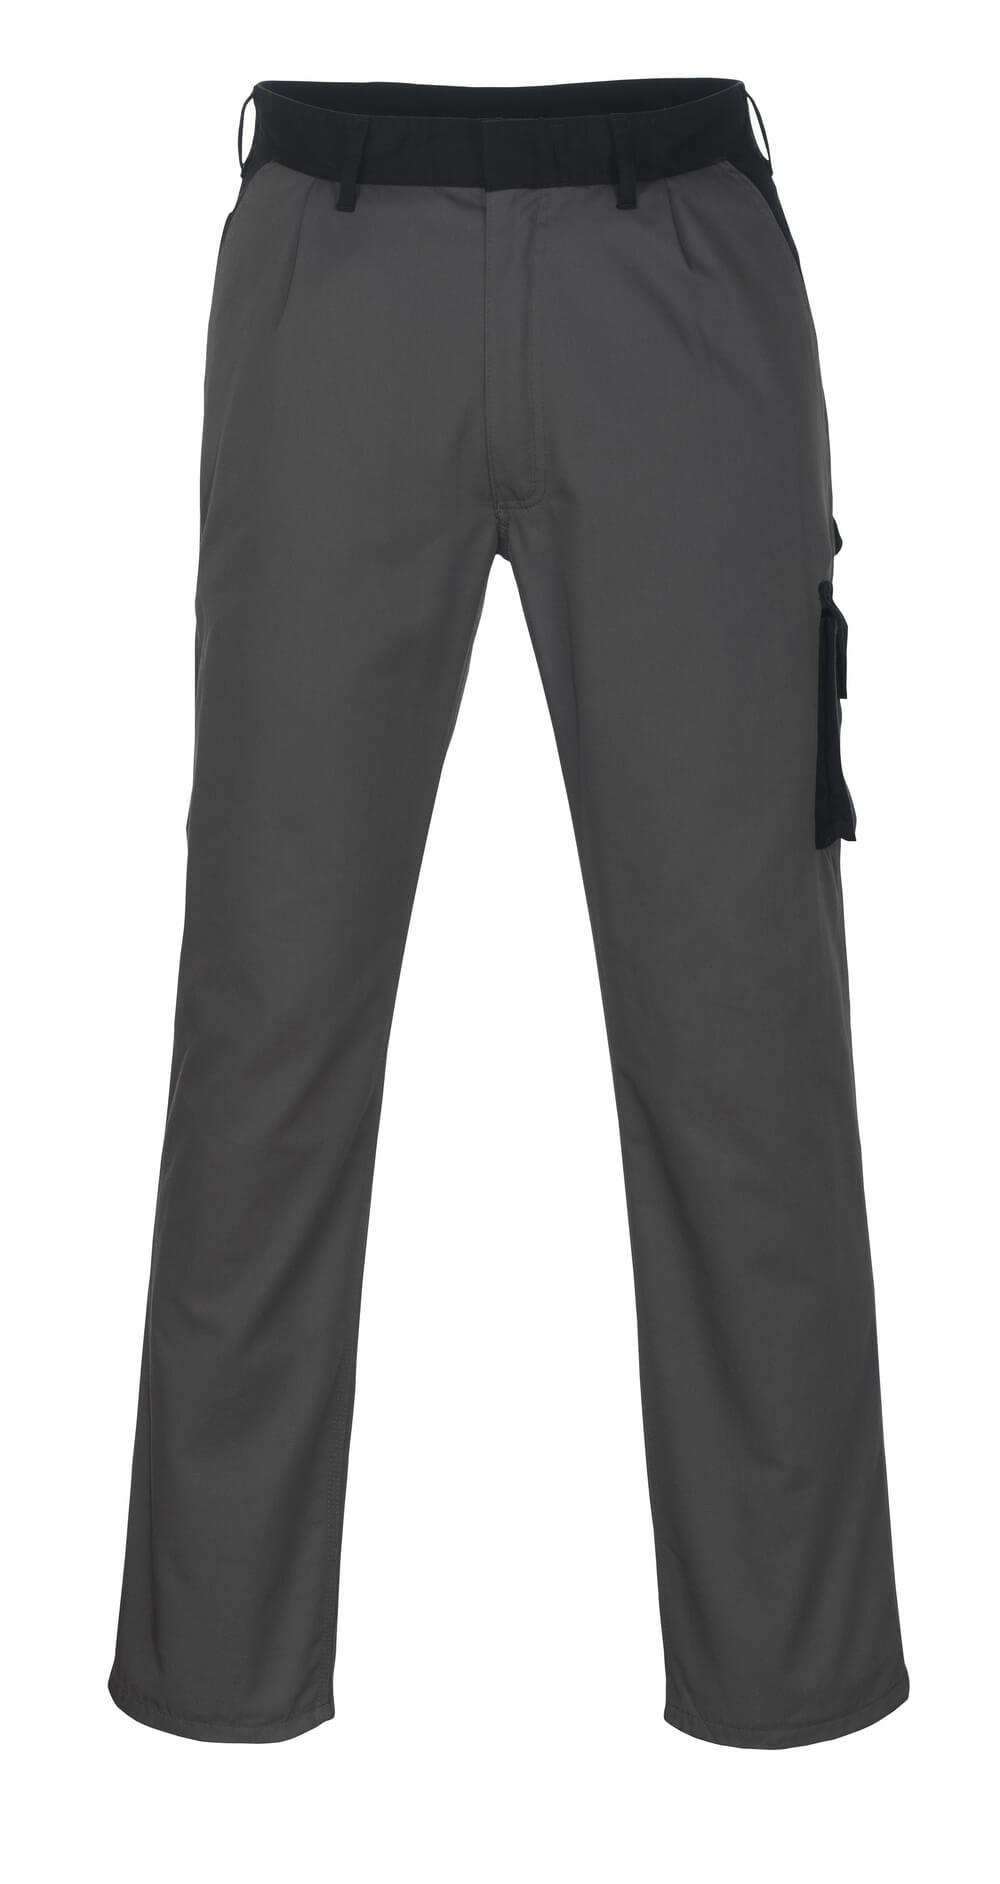 08779-442-8889 Bukser med lårlommer - antracit/sort